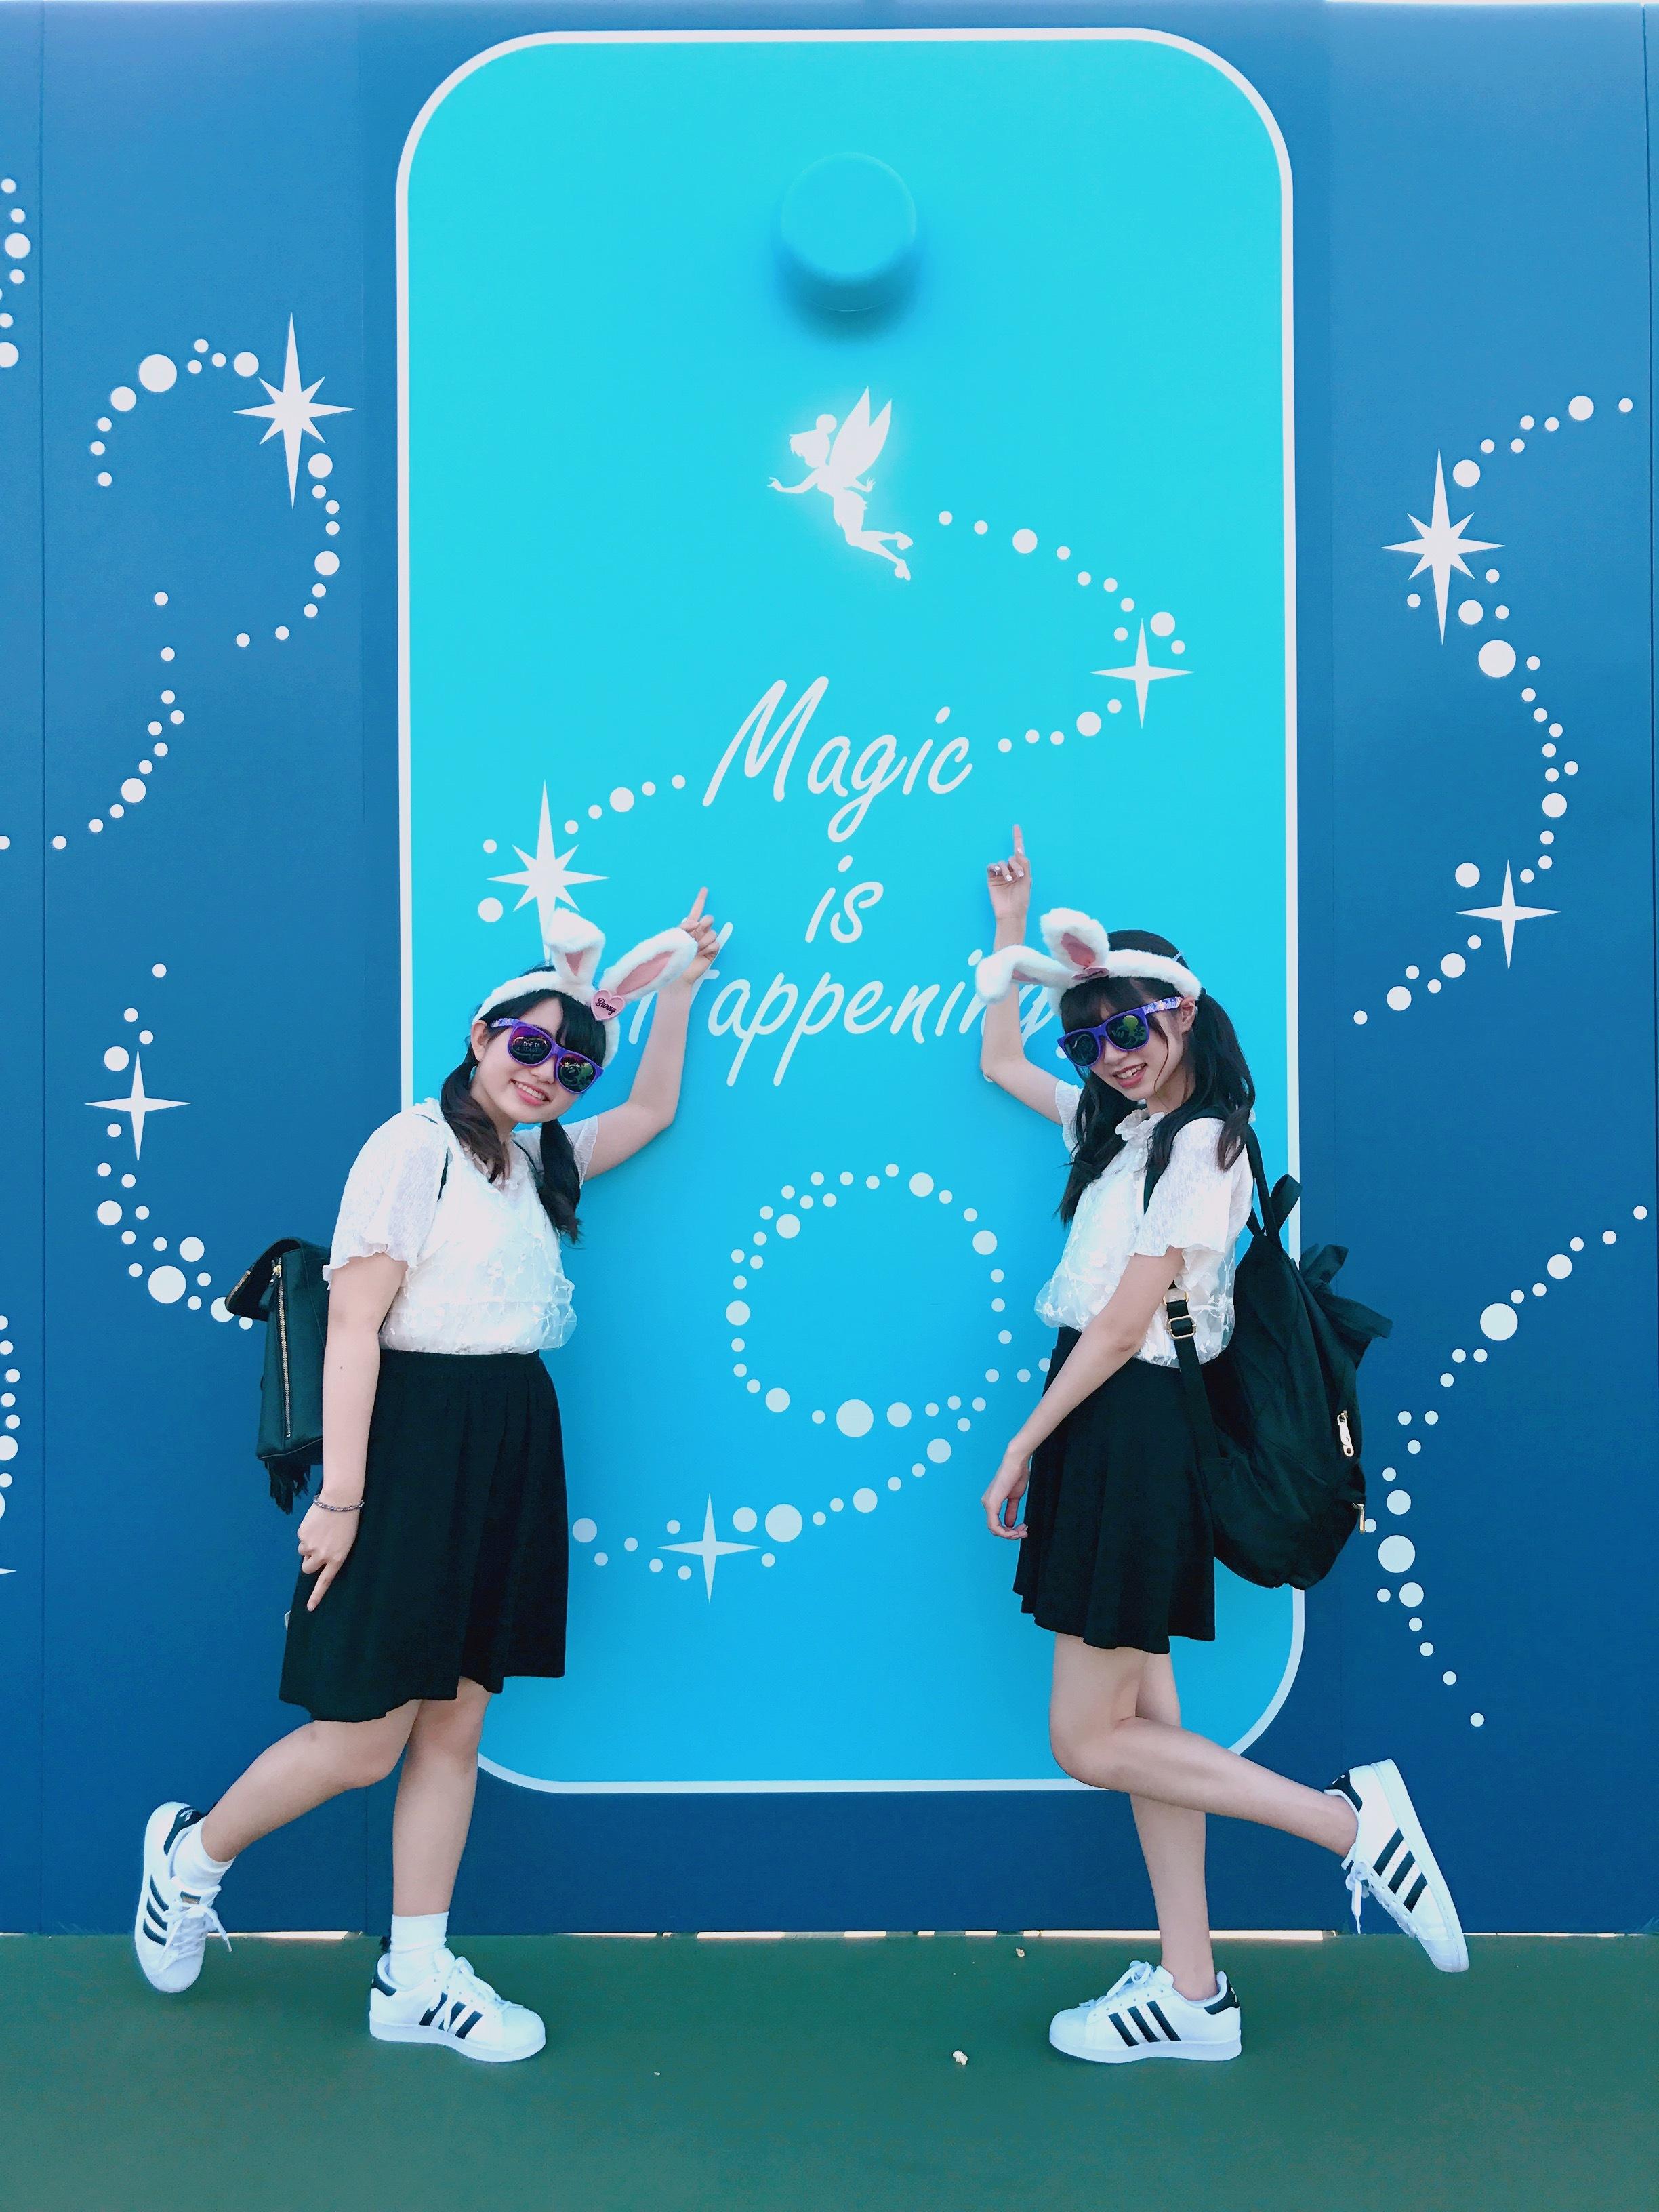 Vol.10♡【ディズニーイースター2017】東京ディズニーランドの写真スポットを紹介☆_1_6